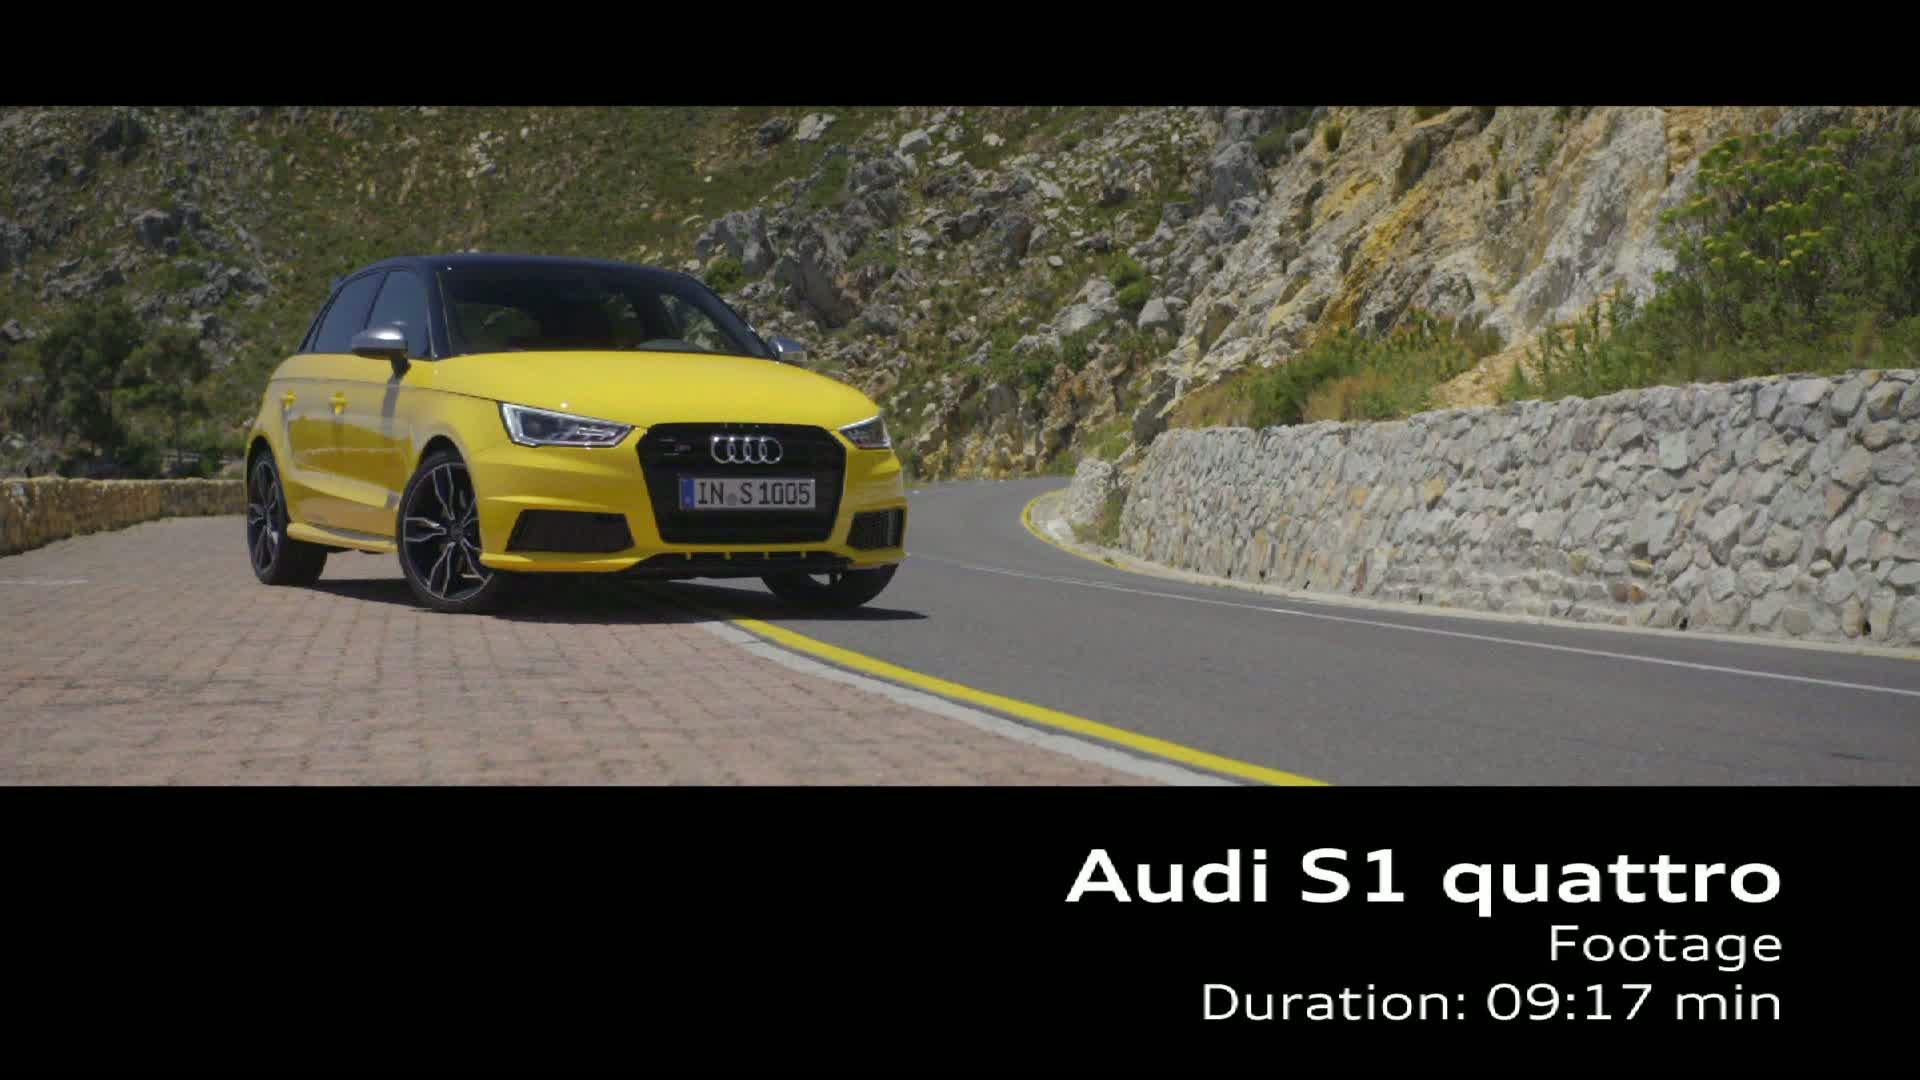 The Audi S1 Sportback